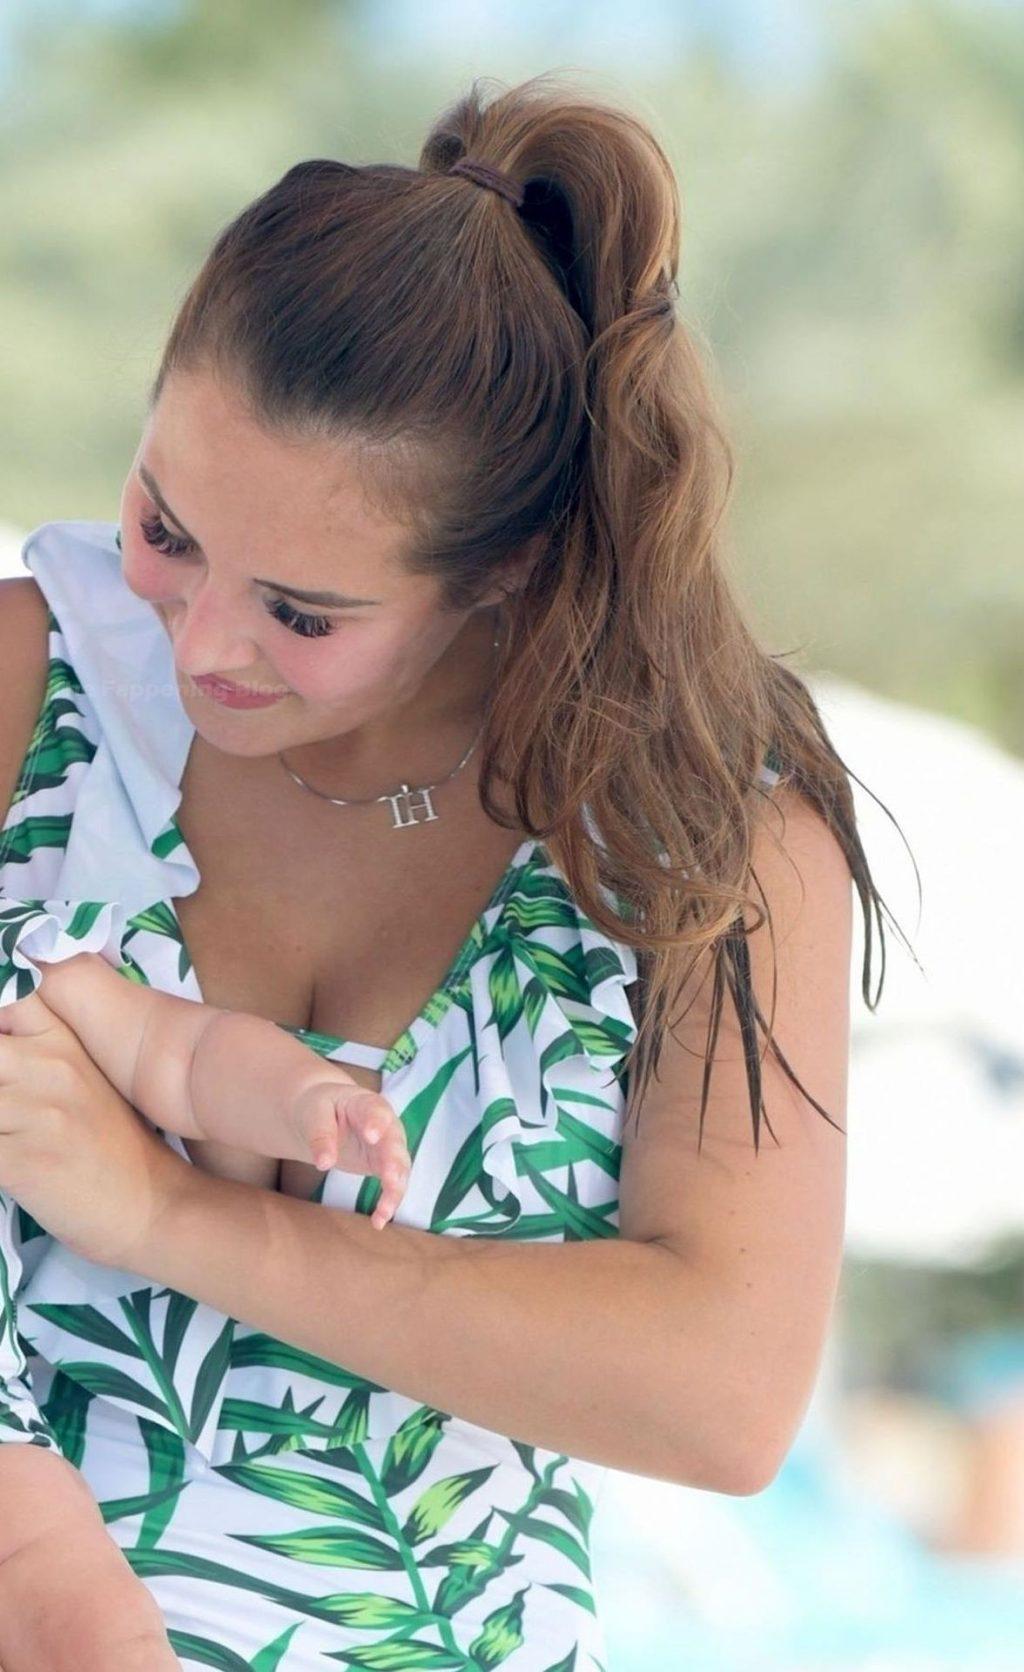 Busty Chloe Goodman is Seen in Dubai (18 Photos)